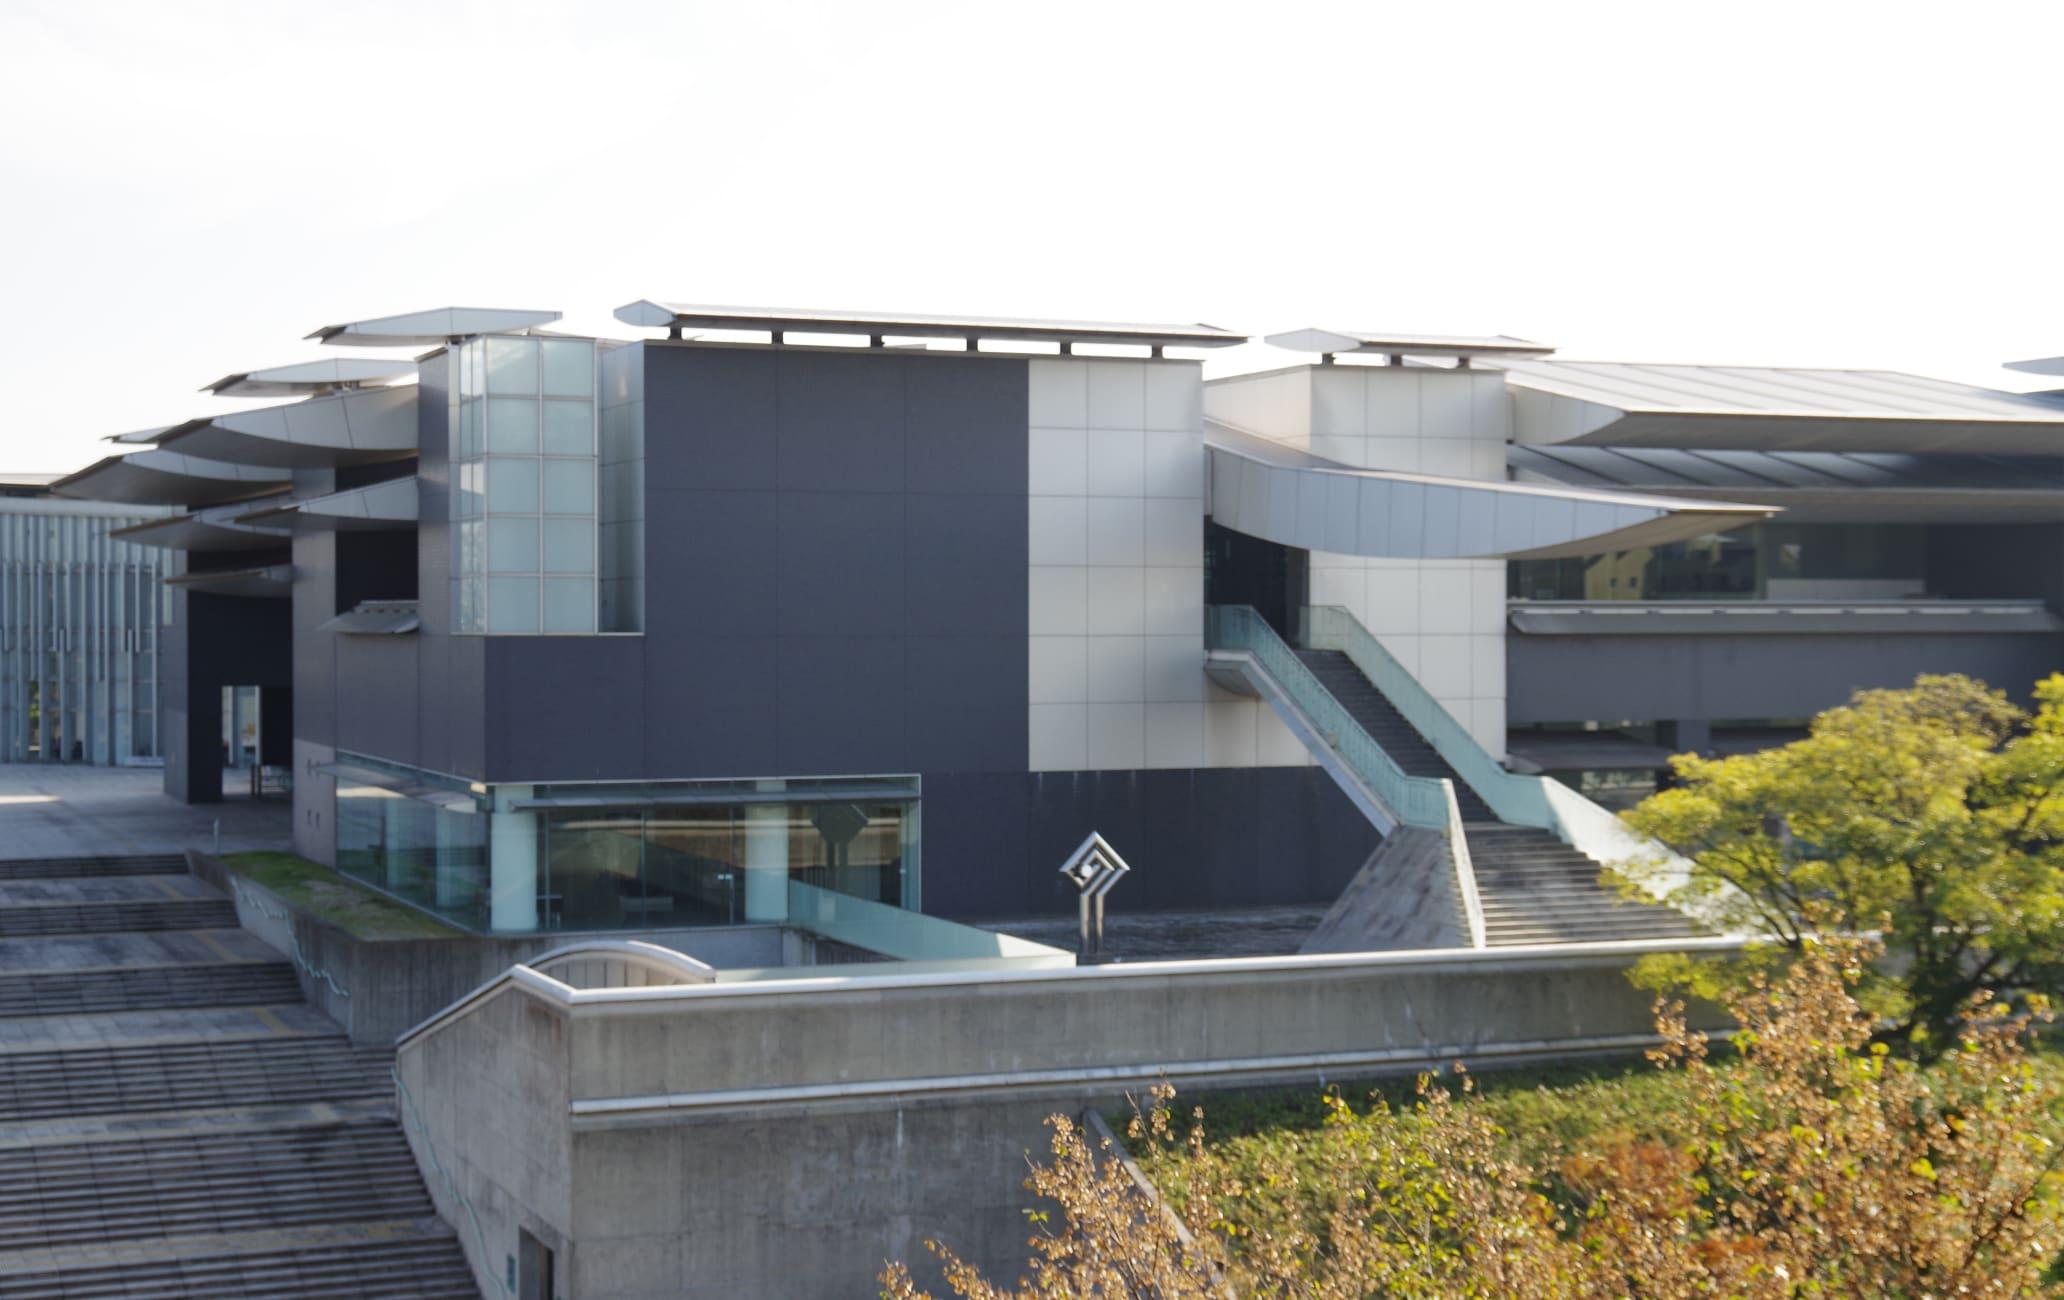 Wakayama Kenritsu Kindai Bijutsukan Museum of Modern Art